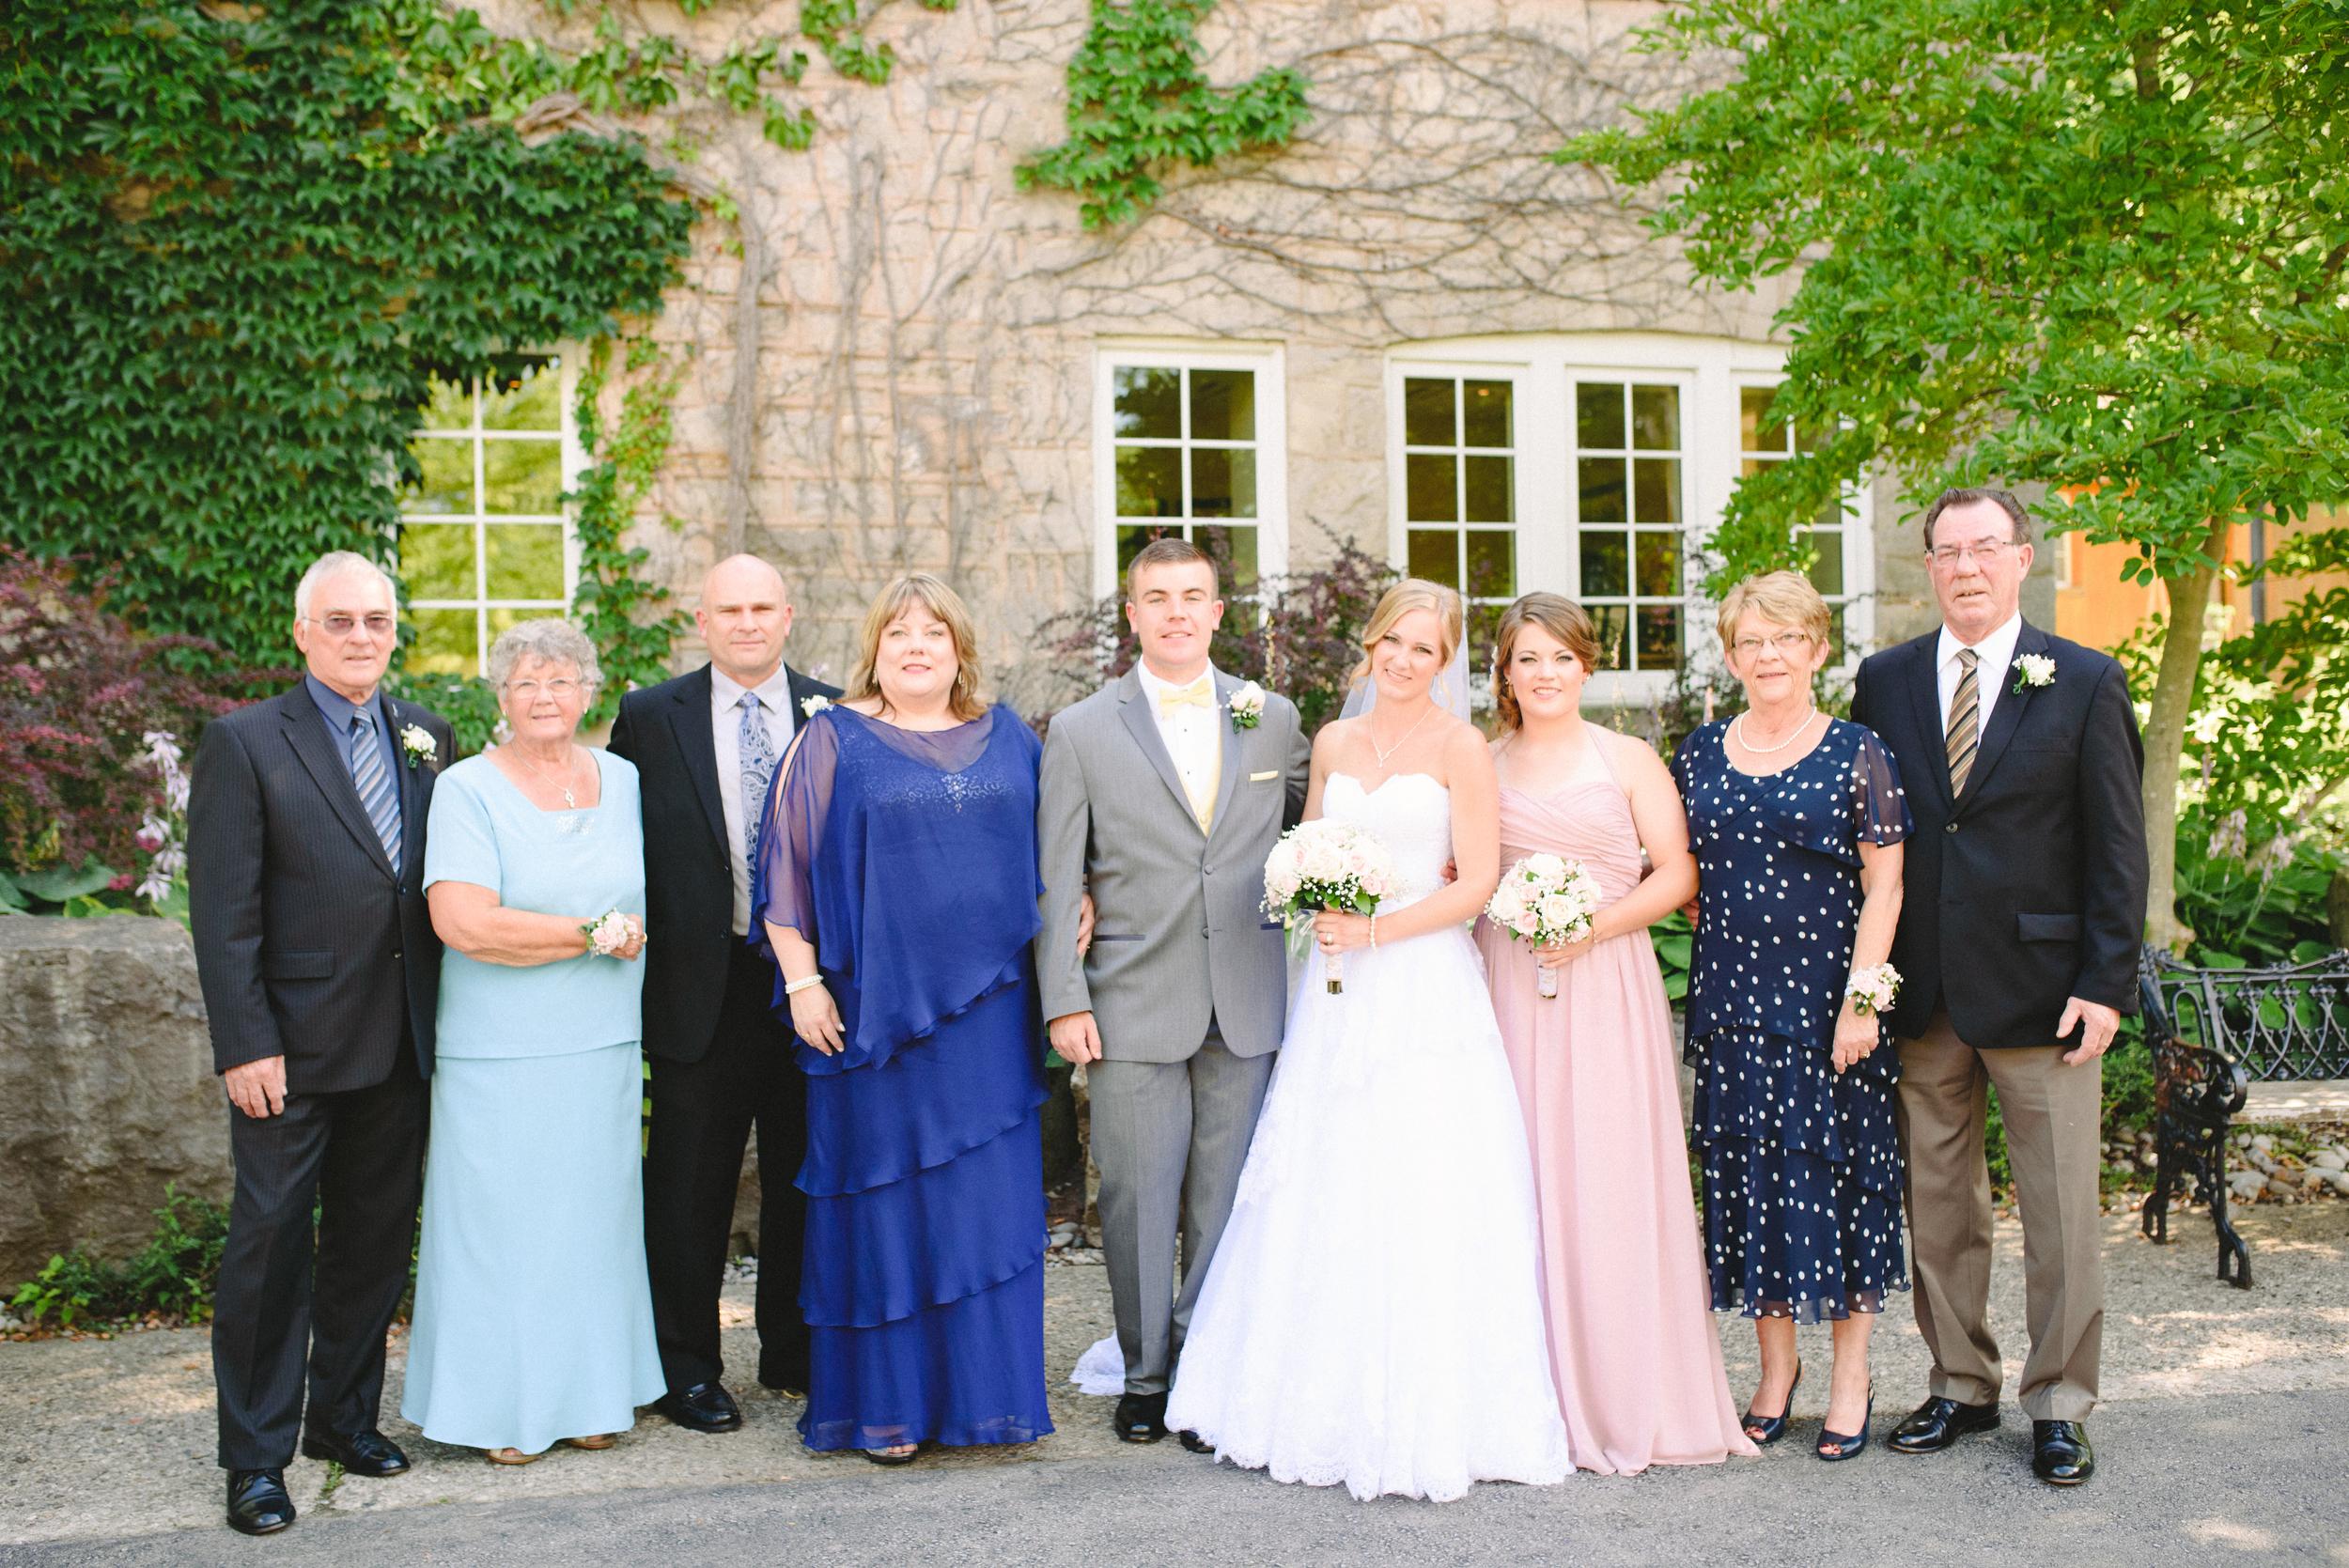 Arynn Photography, Toronto wedding photographer, Durham wedding photographer, how to organize family photos, family wedding photos, wedding family portraits,